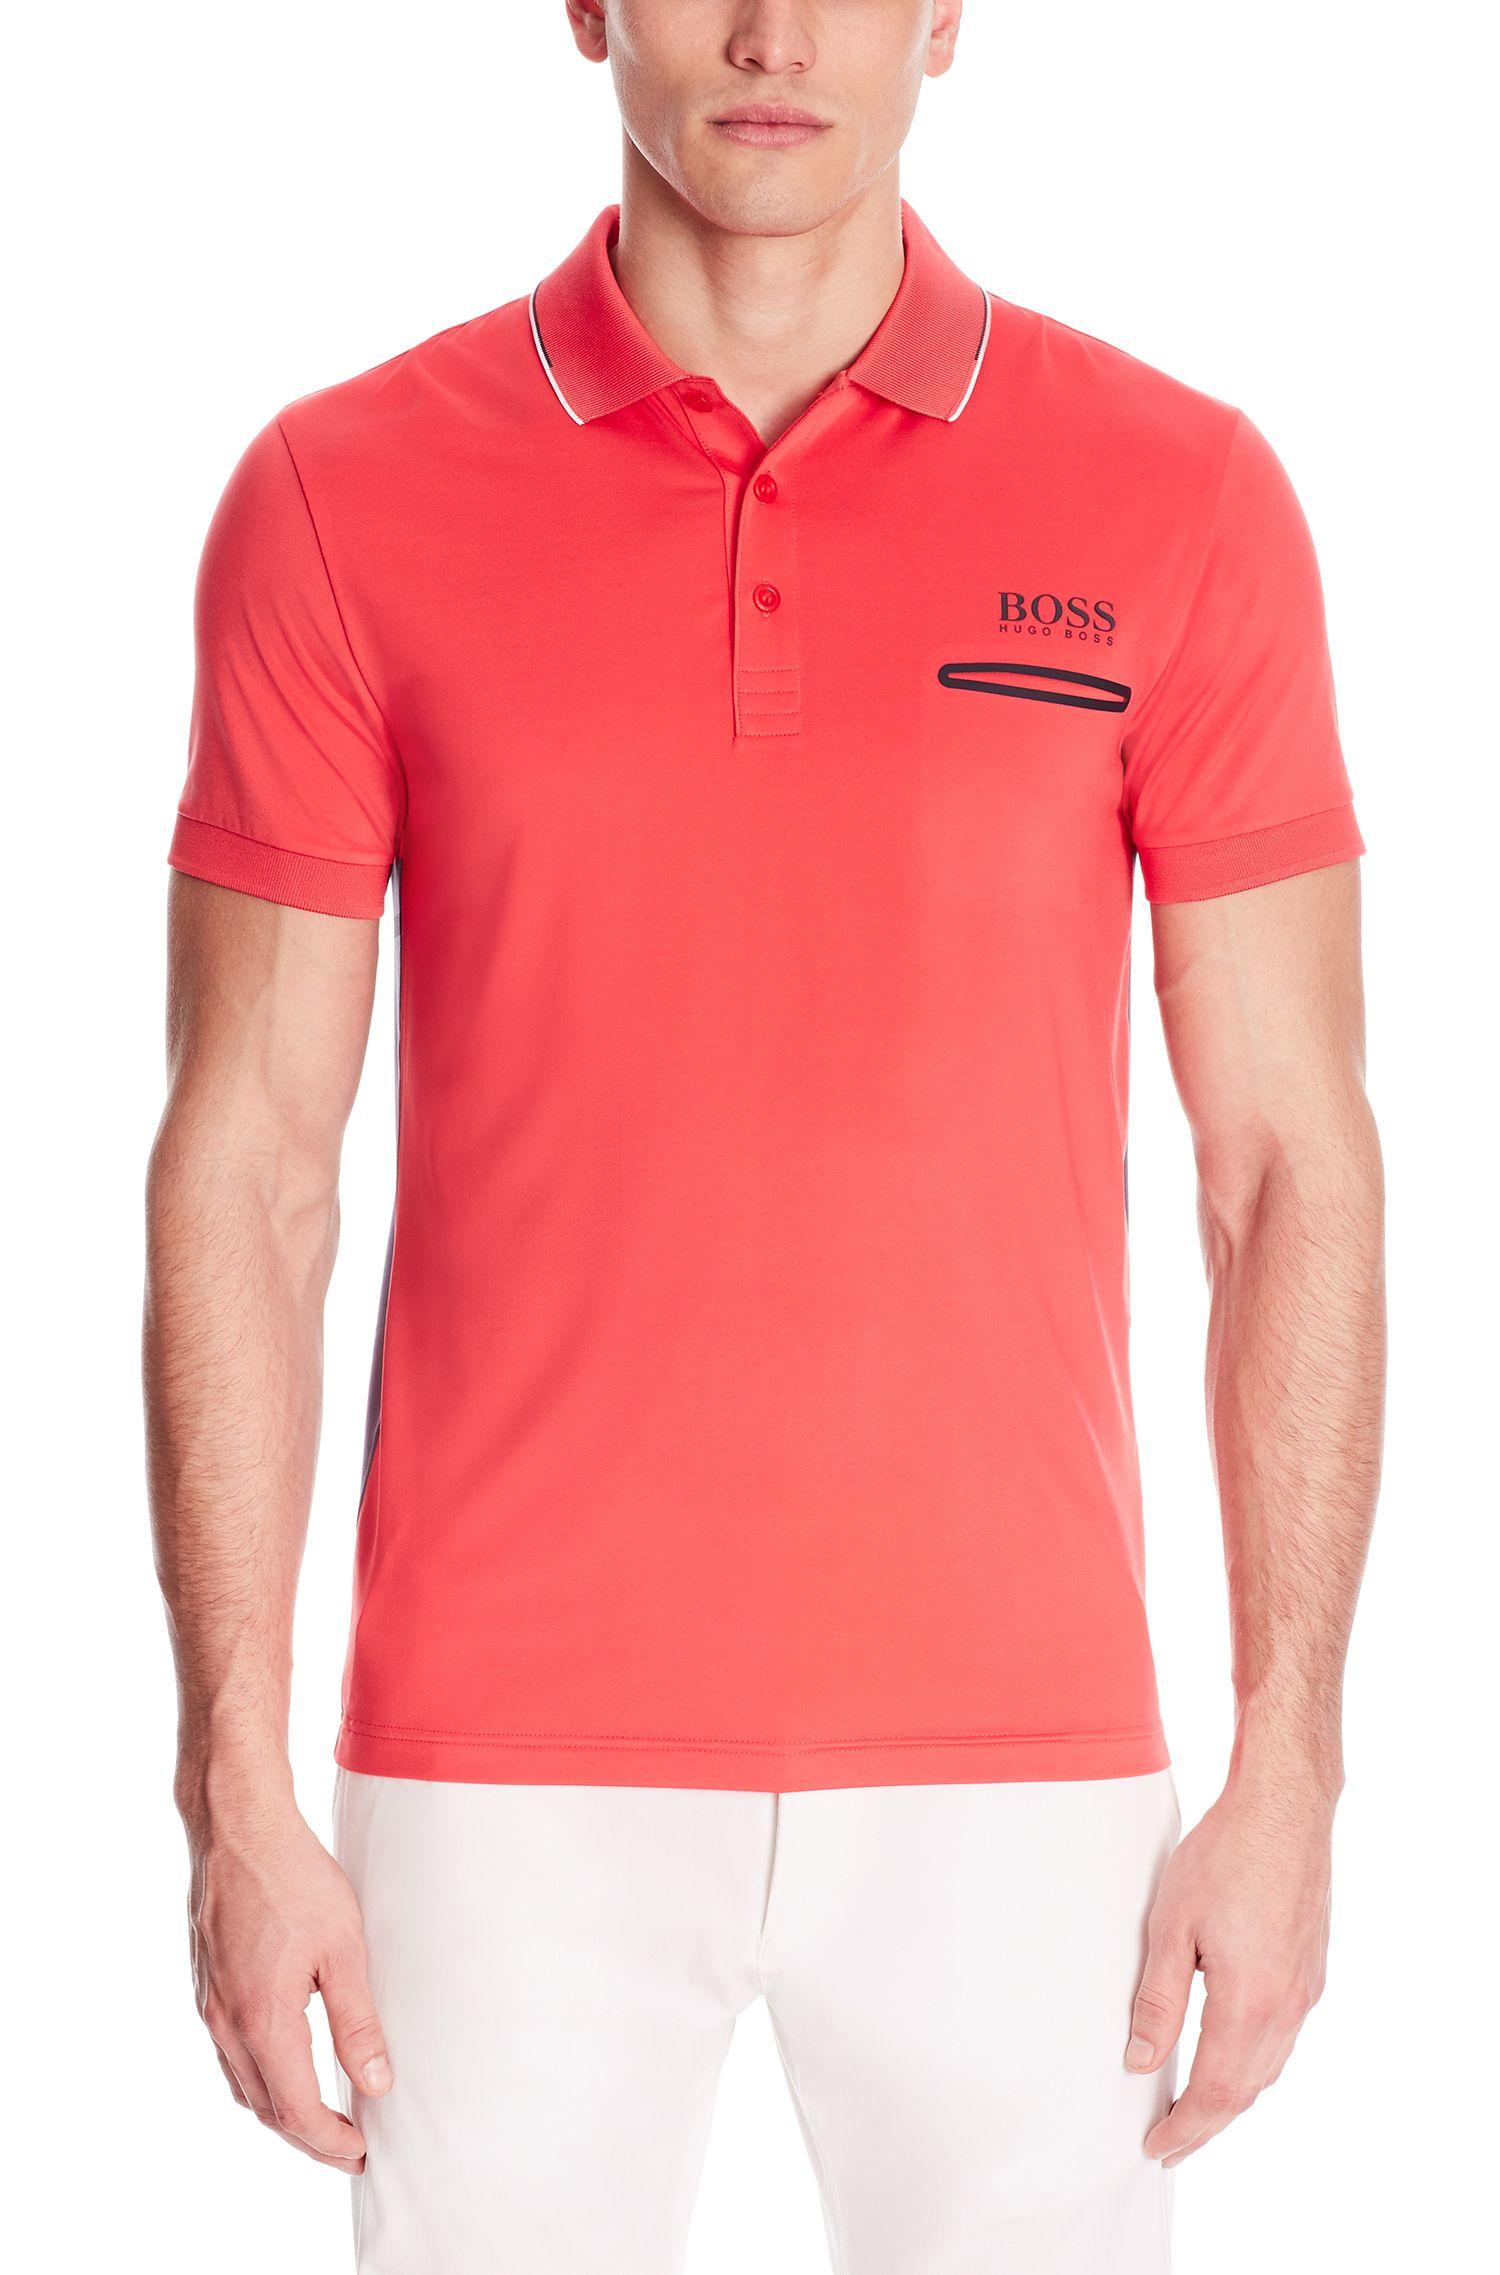 'Paule Pro' | Slim Fit, Moisture Manager Stretch Cotton Blend Polo Shirt